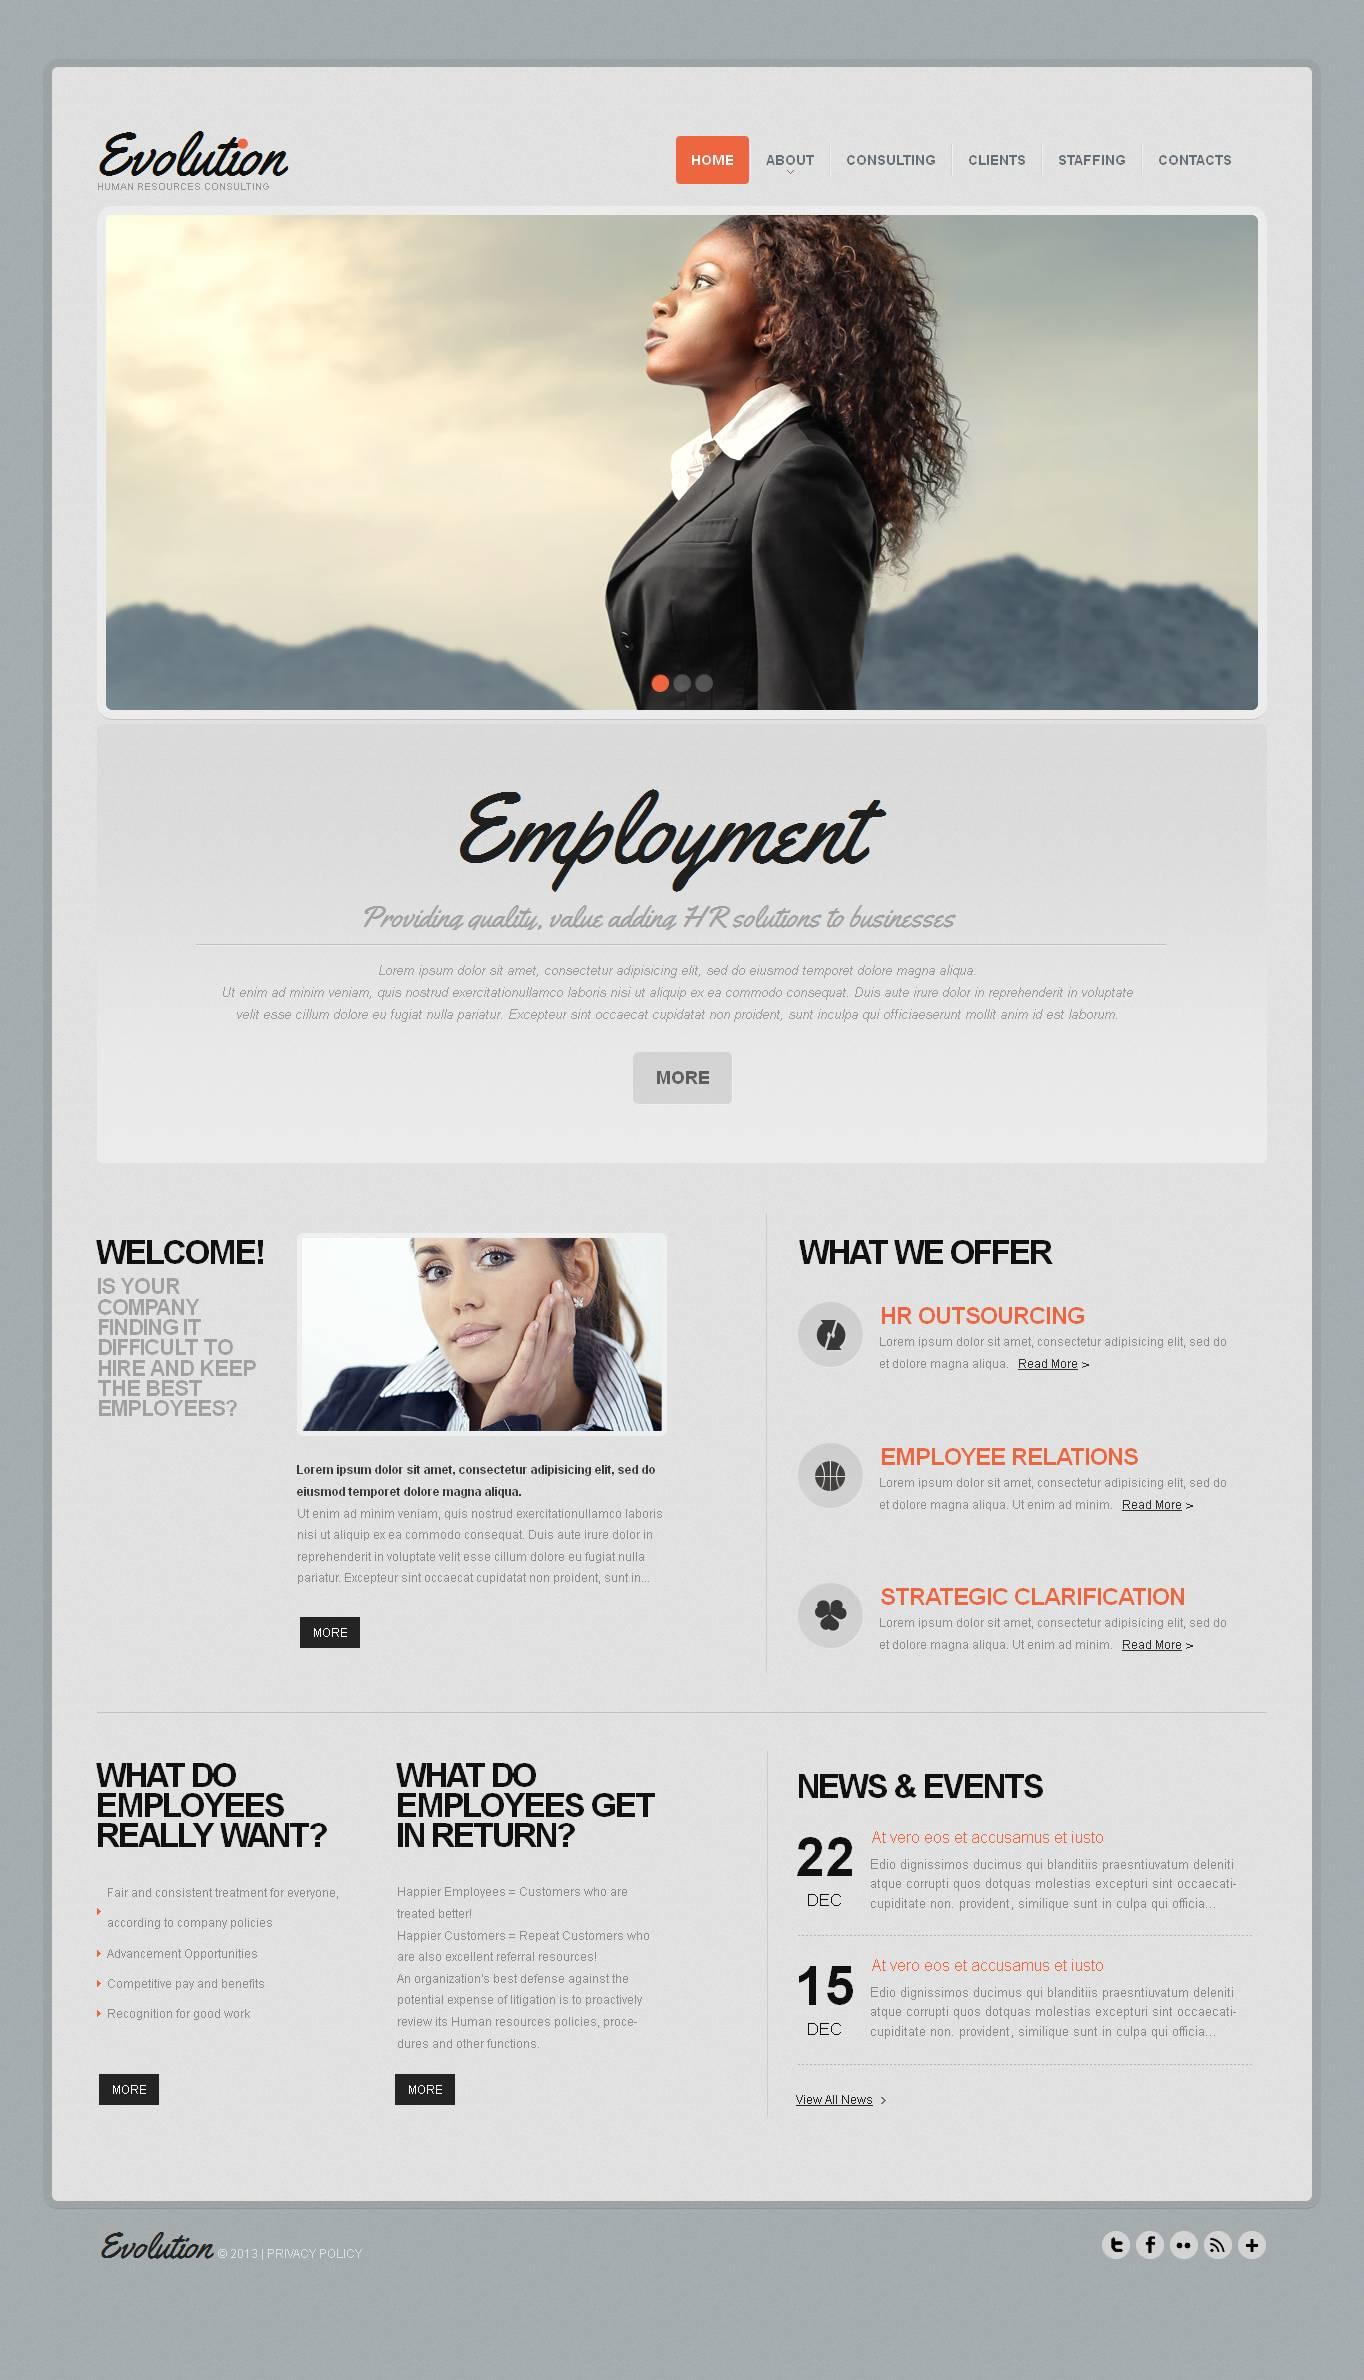 Job Portal Moto CMS HTML Template - screenshot